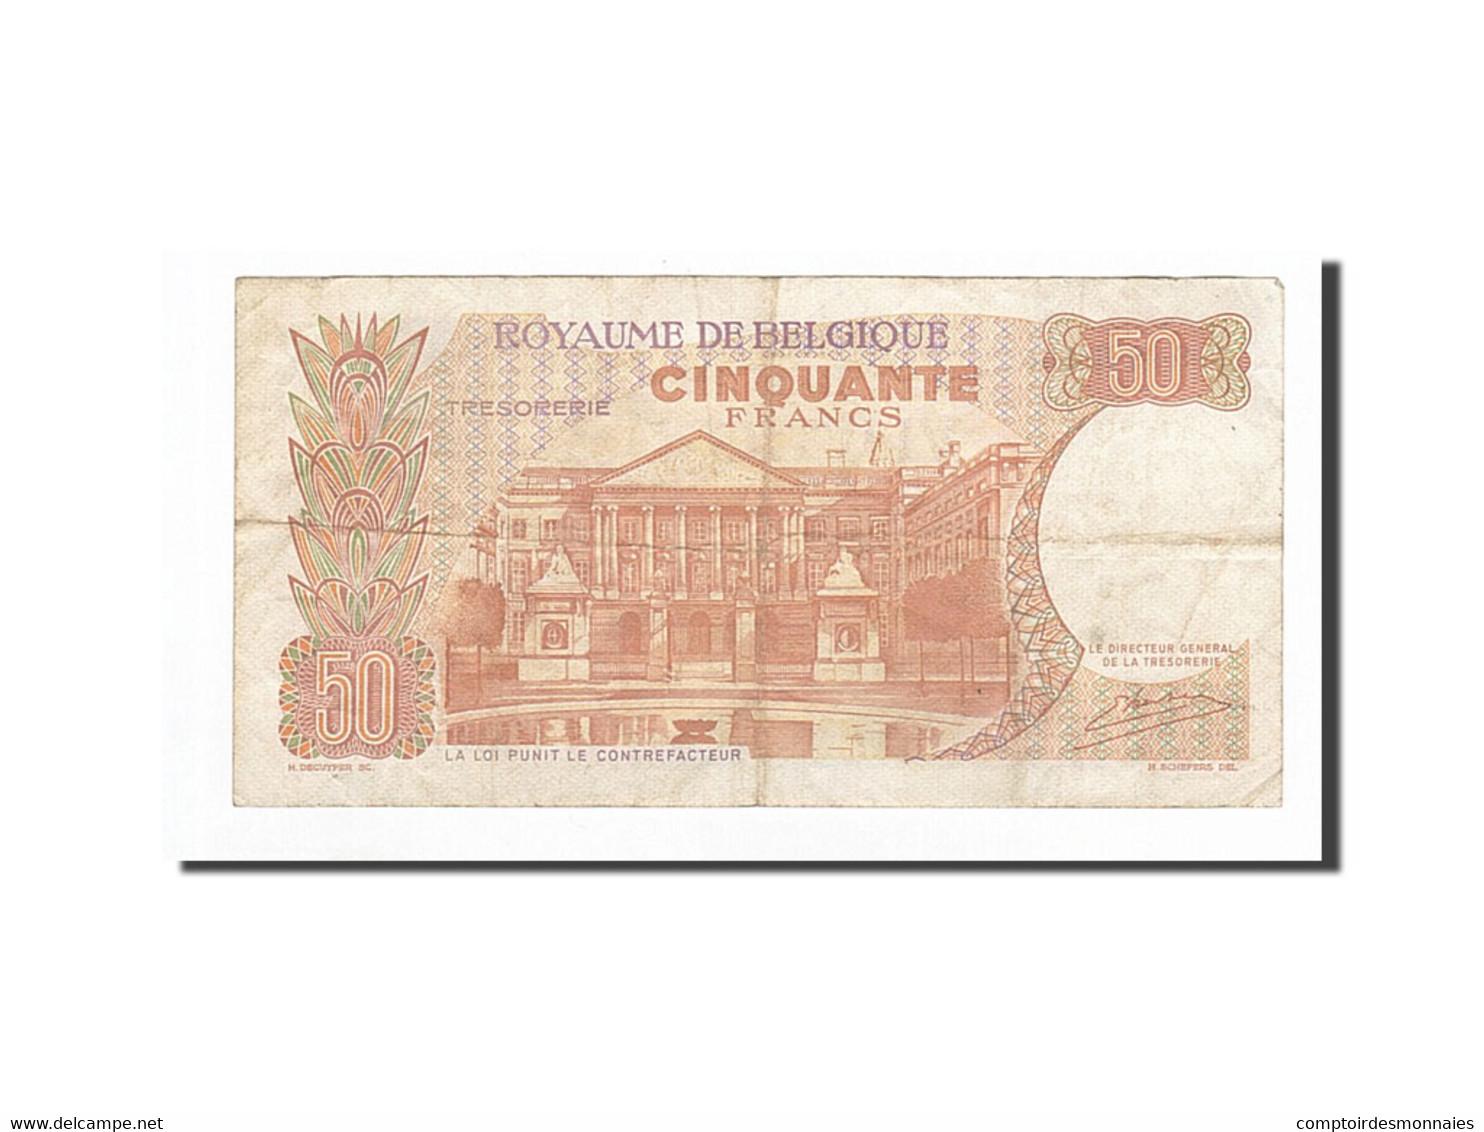 Belgique, 50 Francs, KM:139, 1966-05-16, TTB - [ 6] Staatskas